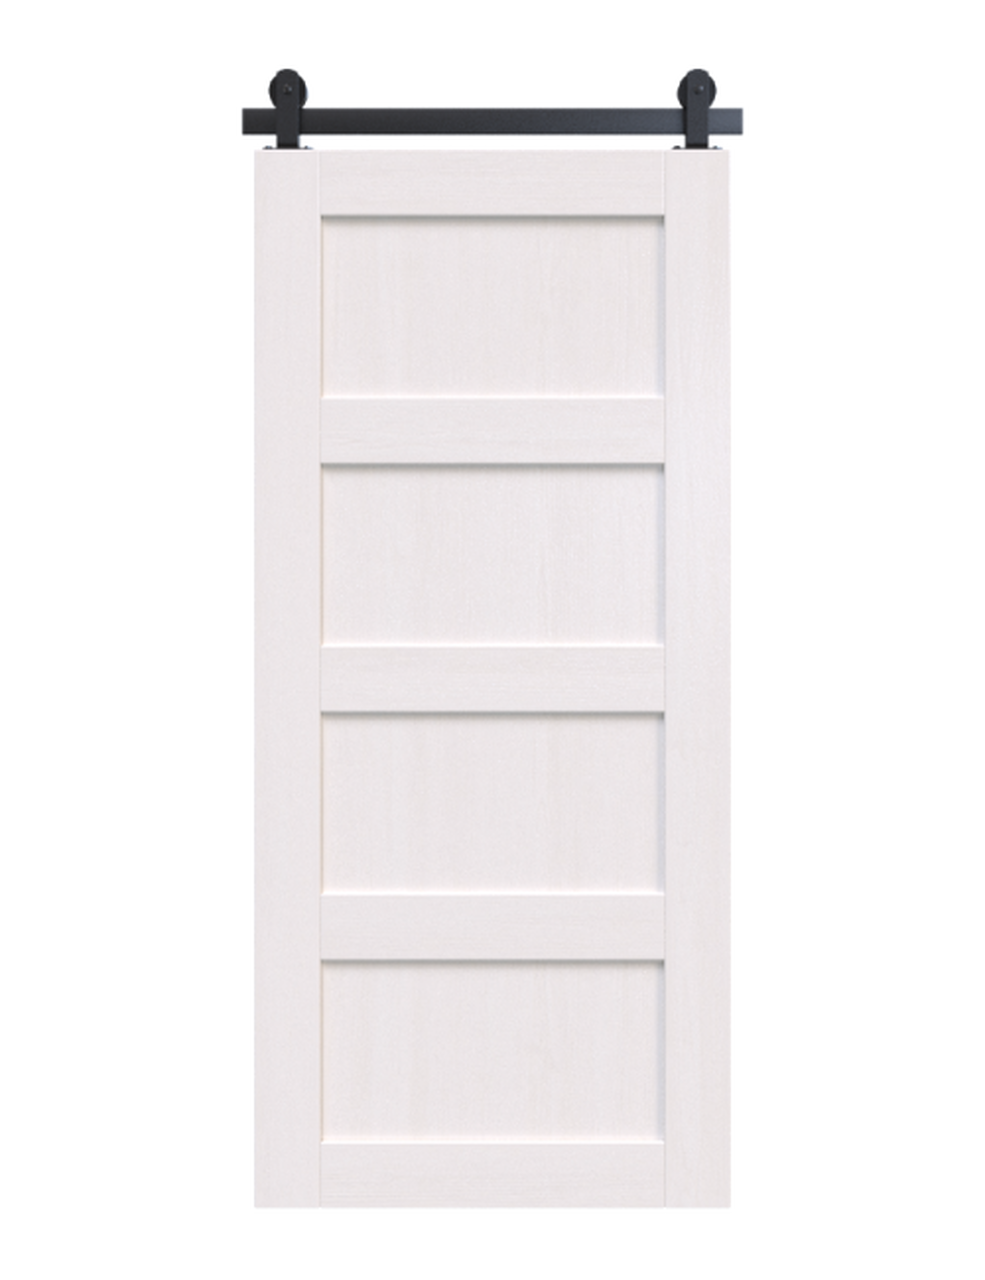 wood white painted 4 panel barn door (Sherwin Williams Extra White)